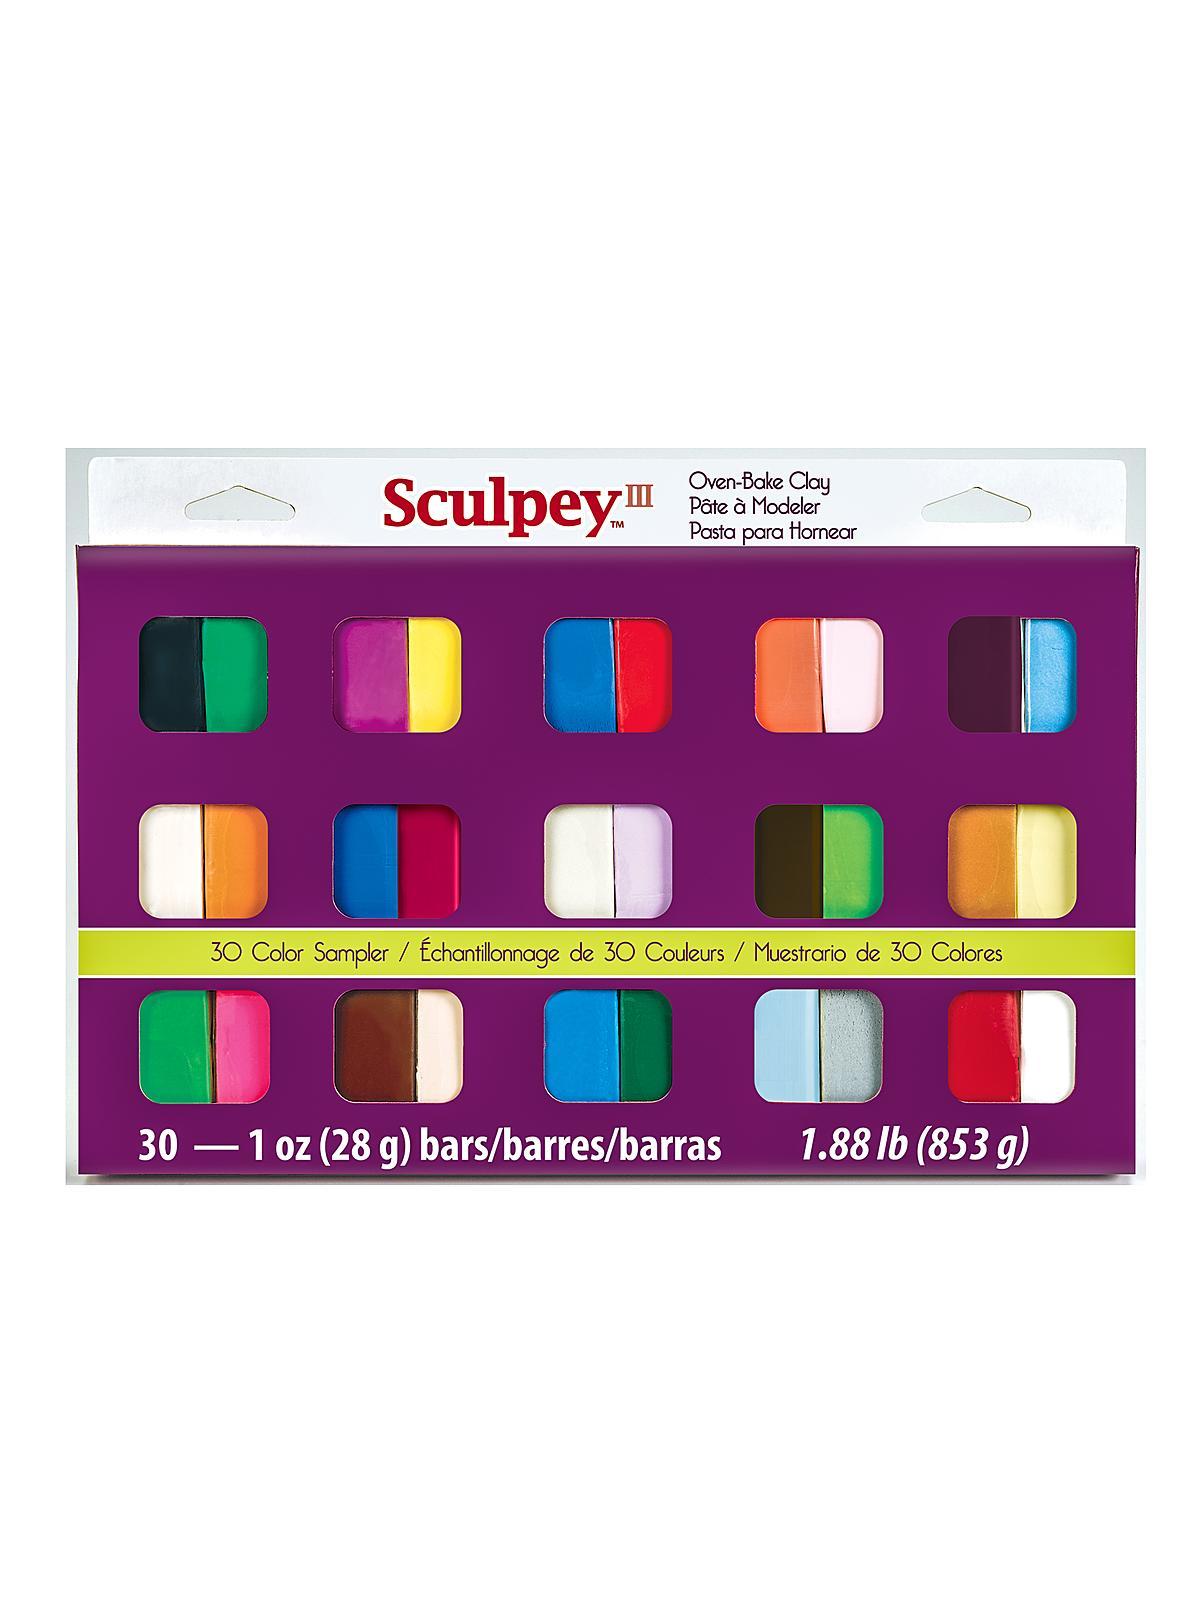 Sculpey - 30-Piece  III Sampler Set